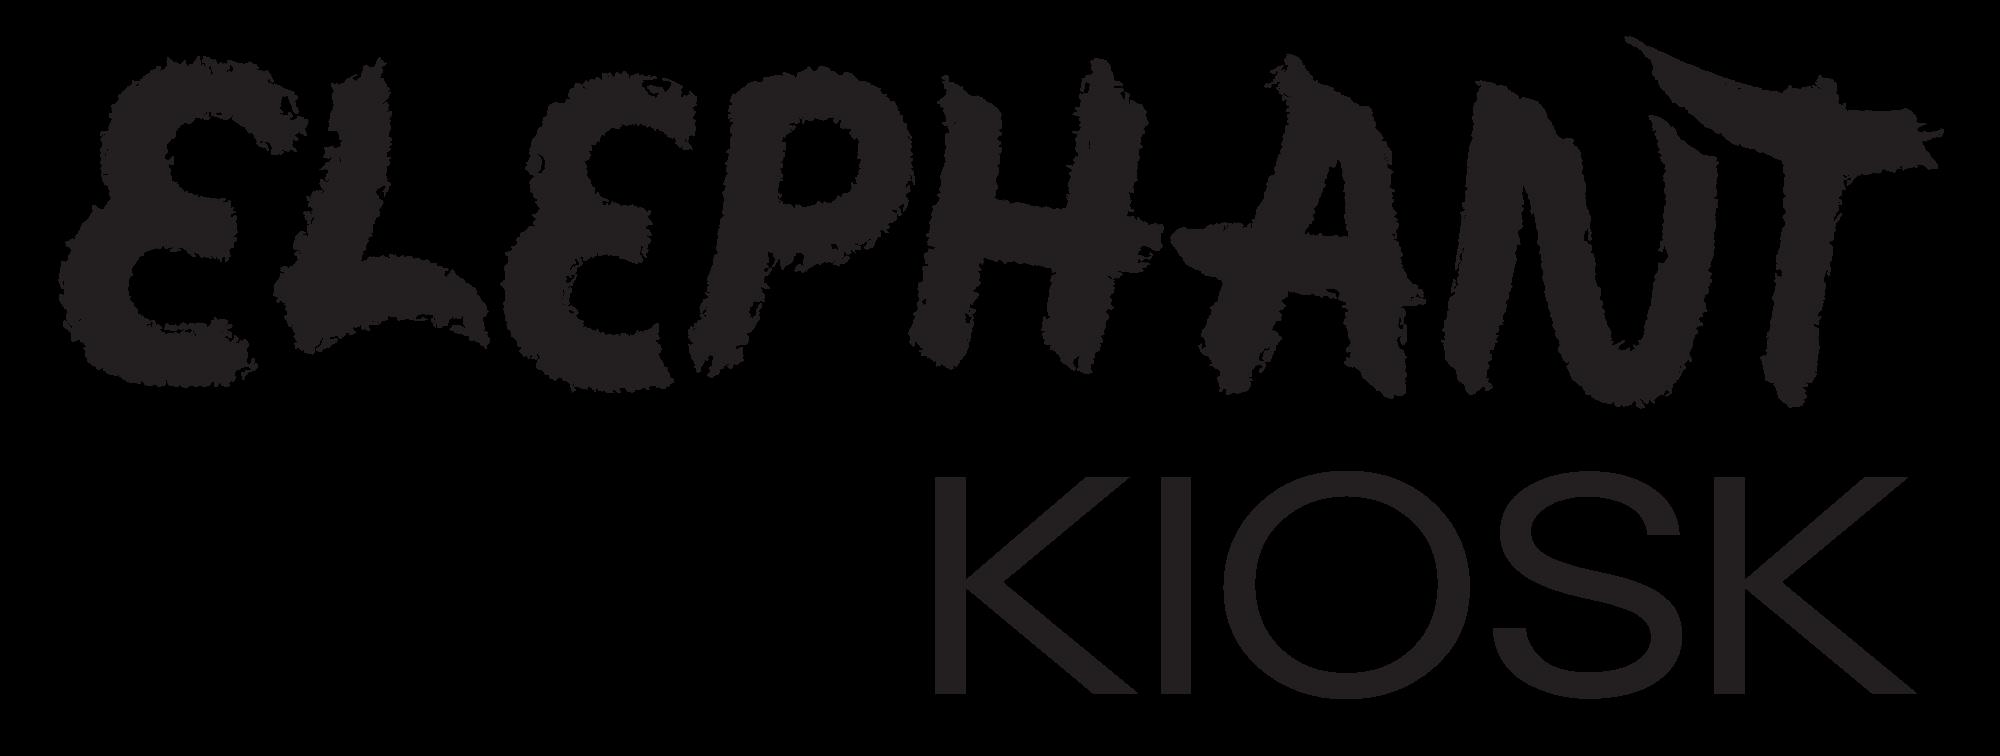 Elephant Kiosk